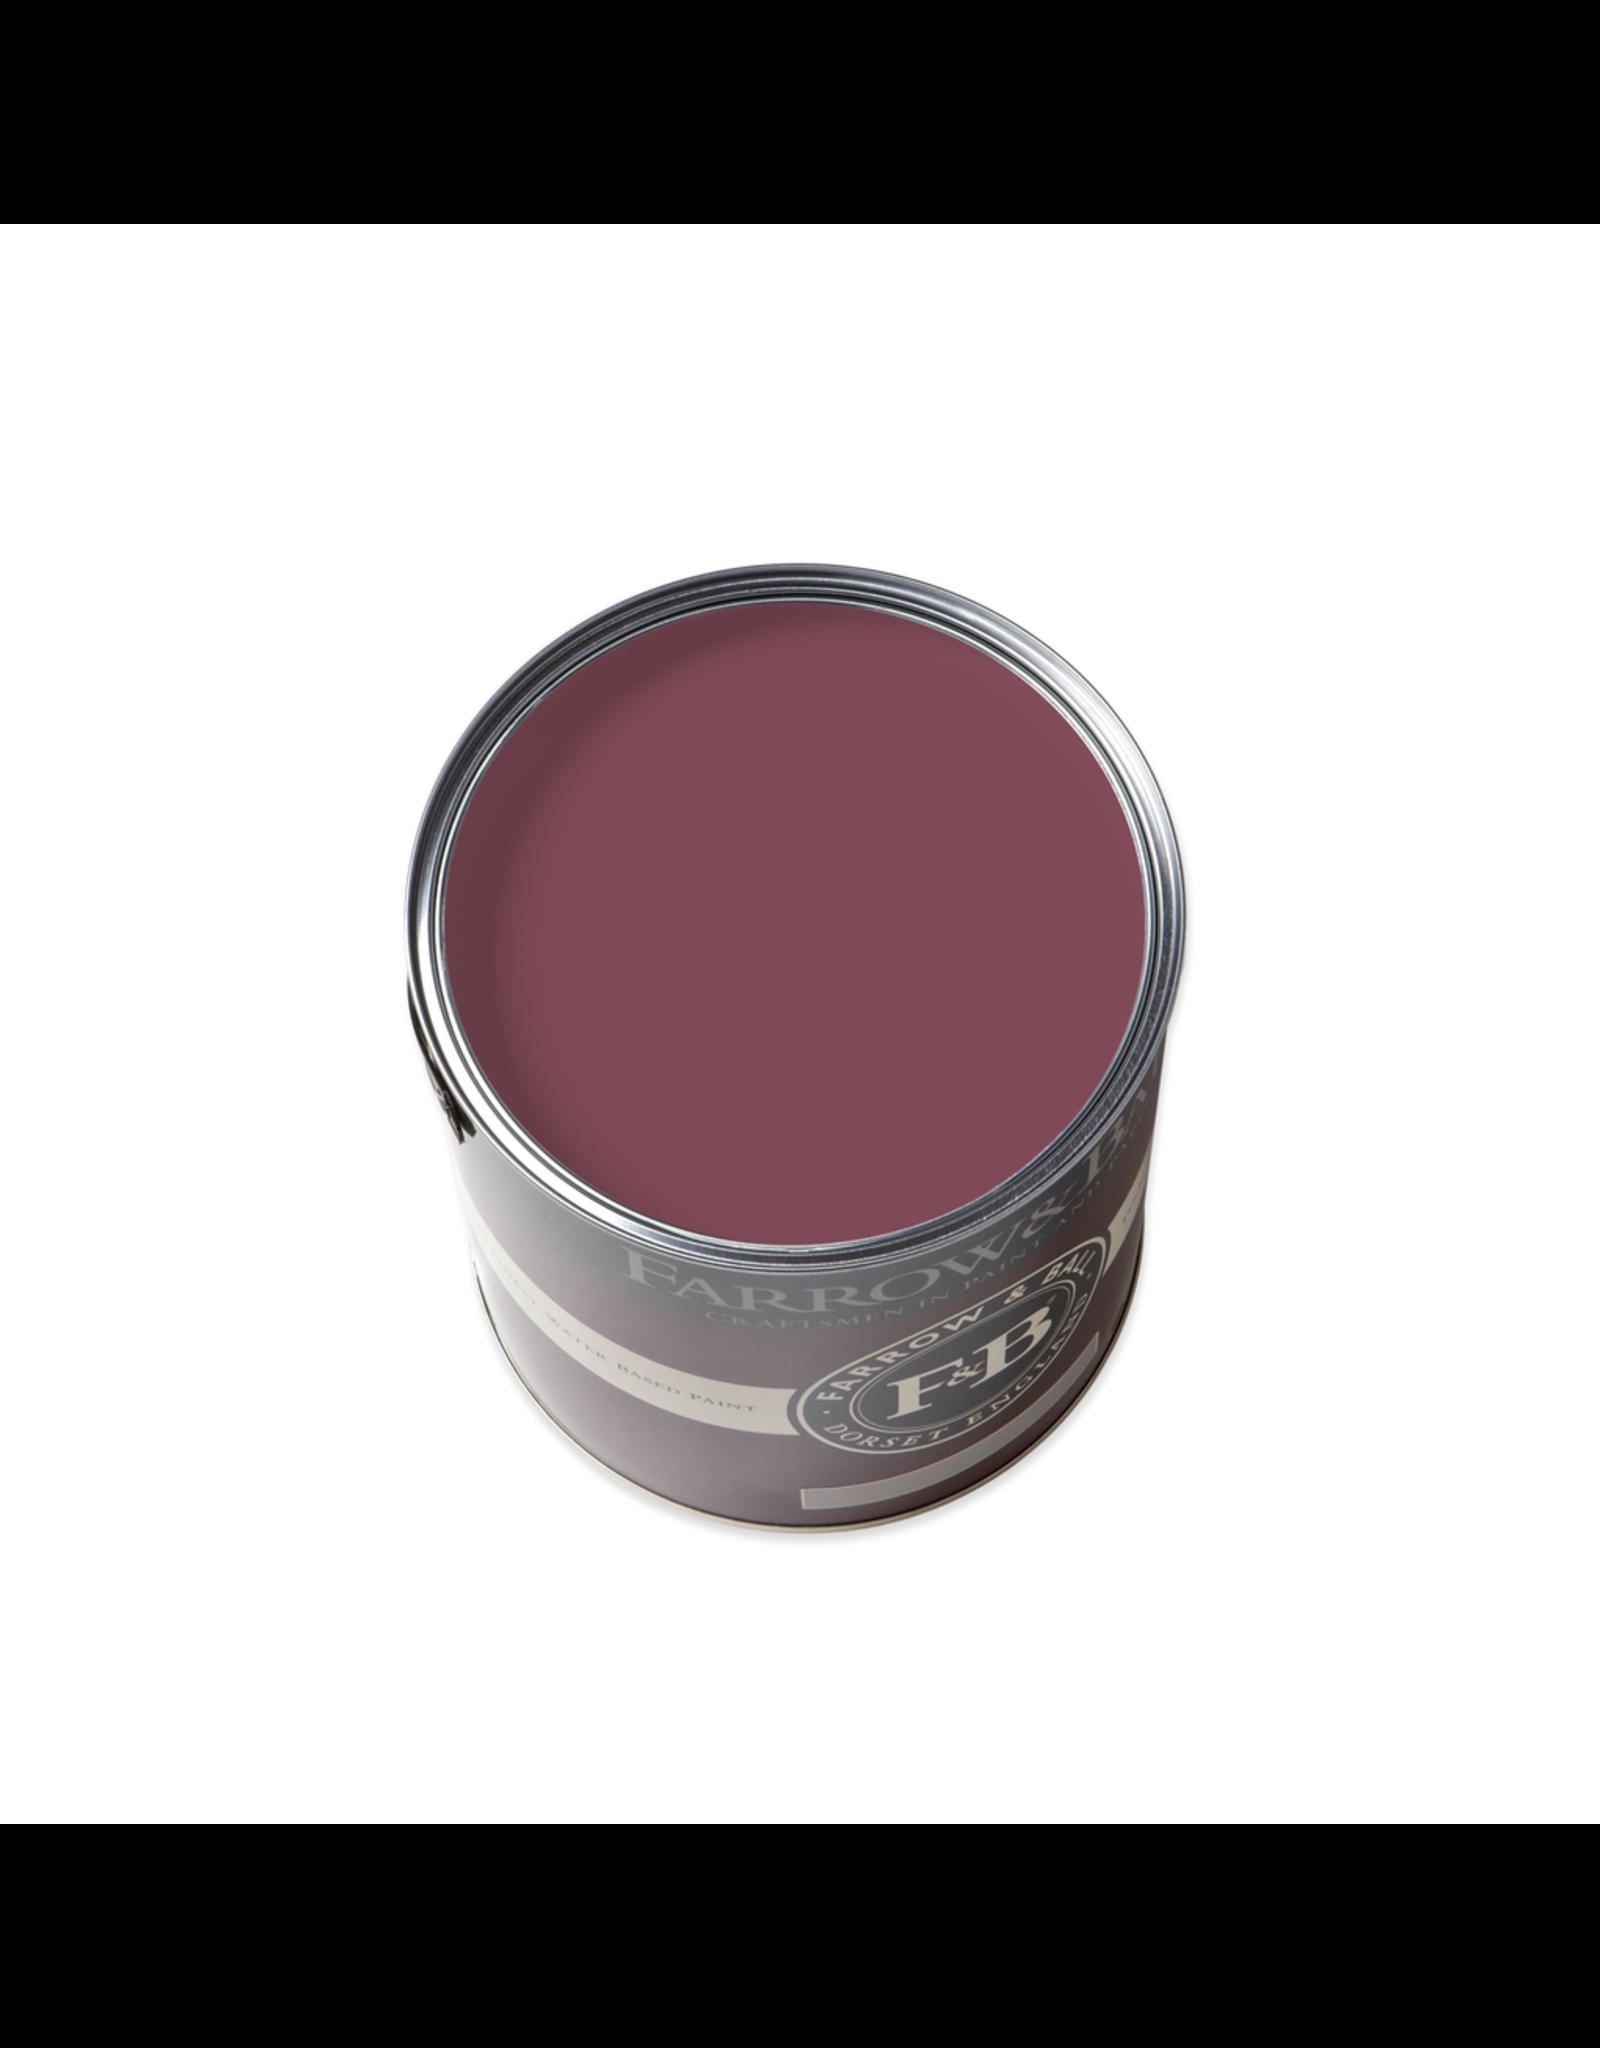 Farrow and Ball Gallon Modern Emulsion Radicchio No 96